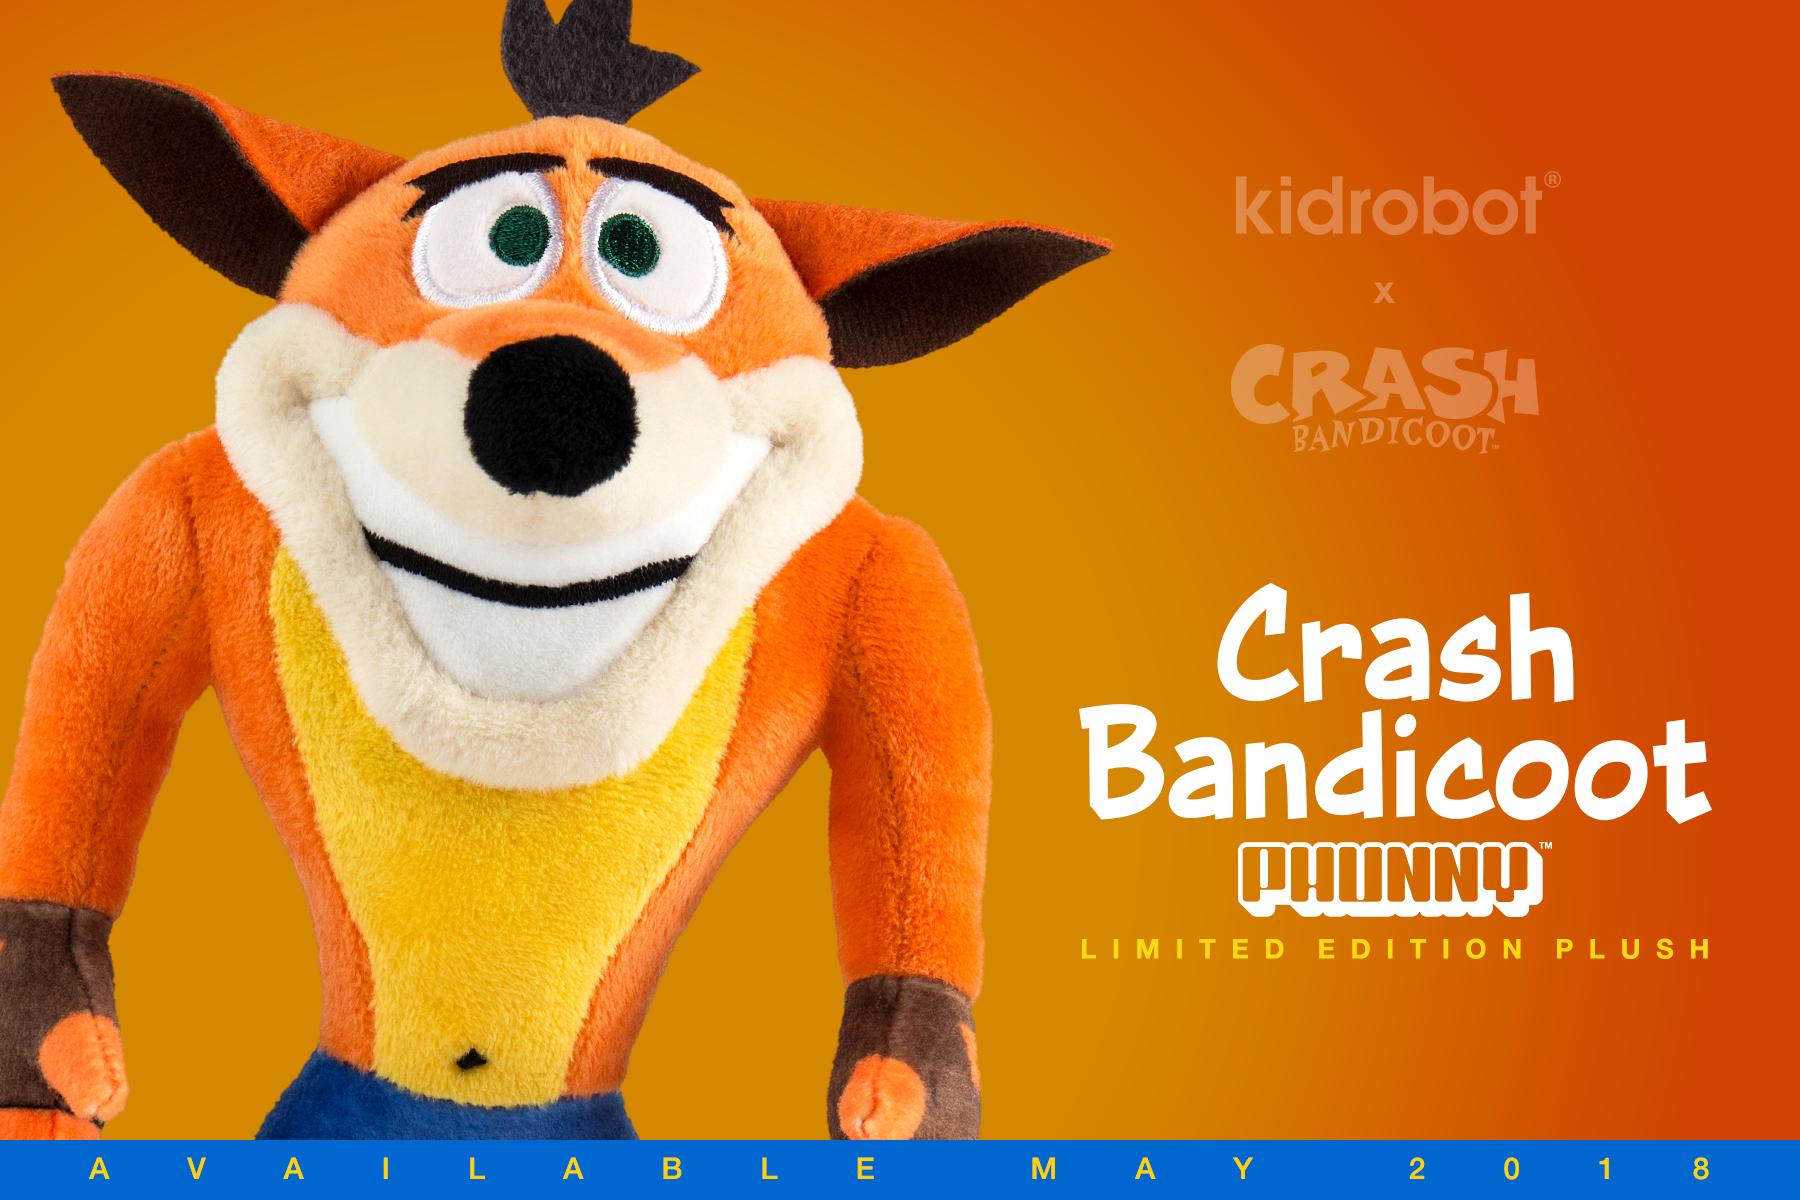 Kidrobot x Crash bandicoot Vinyl Figure Mini Series